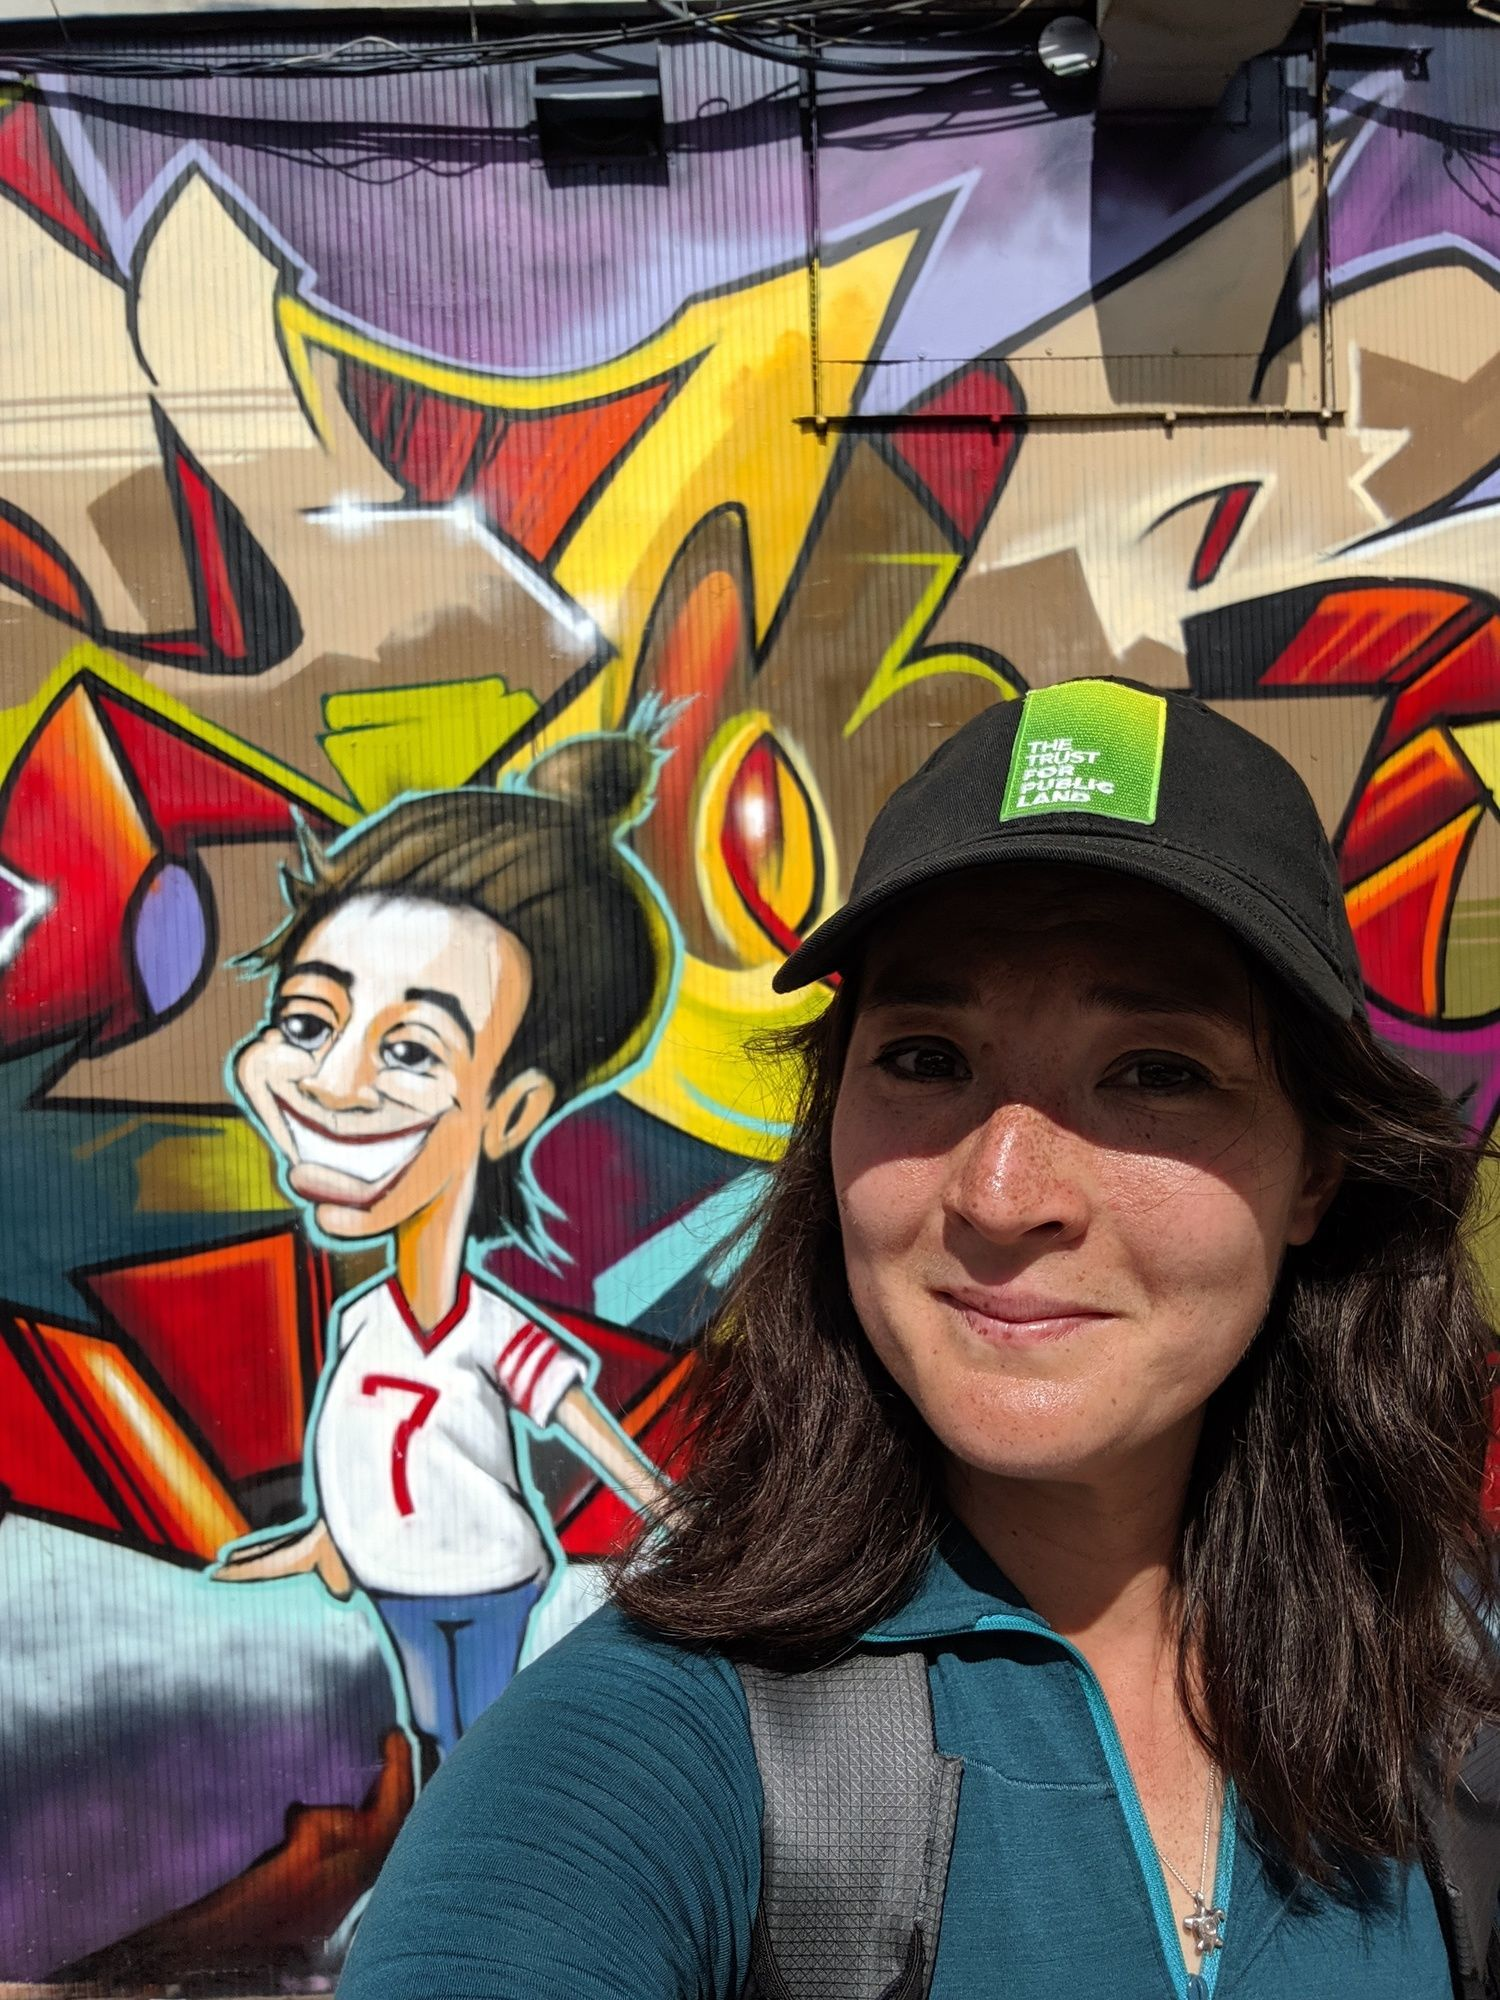 Liz Thomas wearing the Arc'Teryx Zip Satoro shirt standing in front of a graffiti wall in New York City.